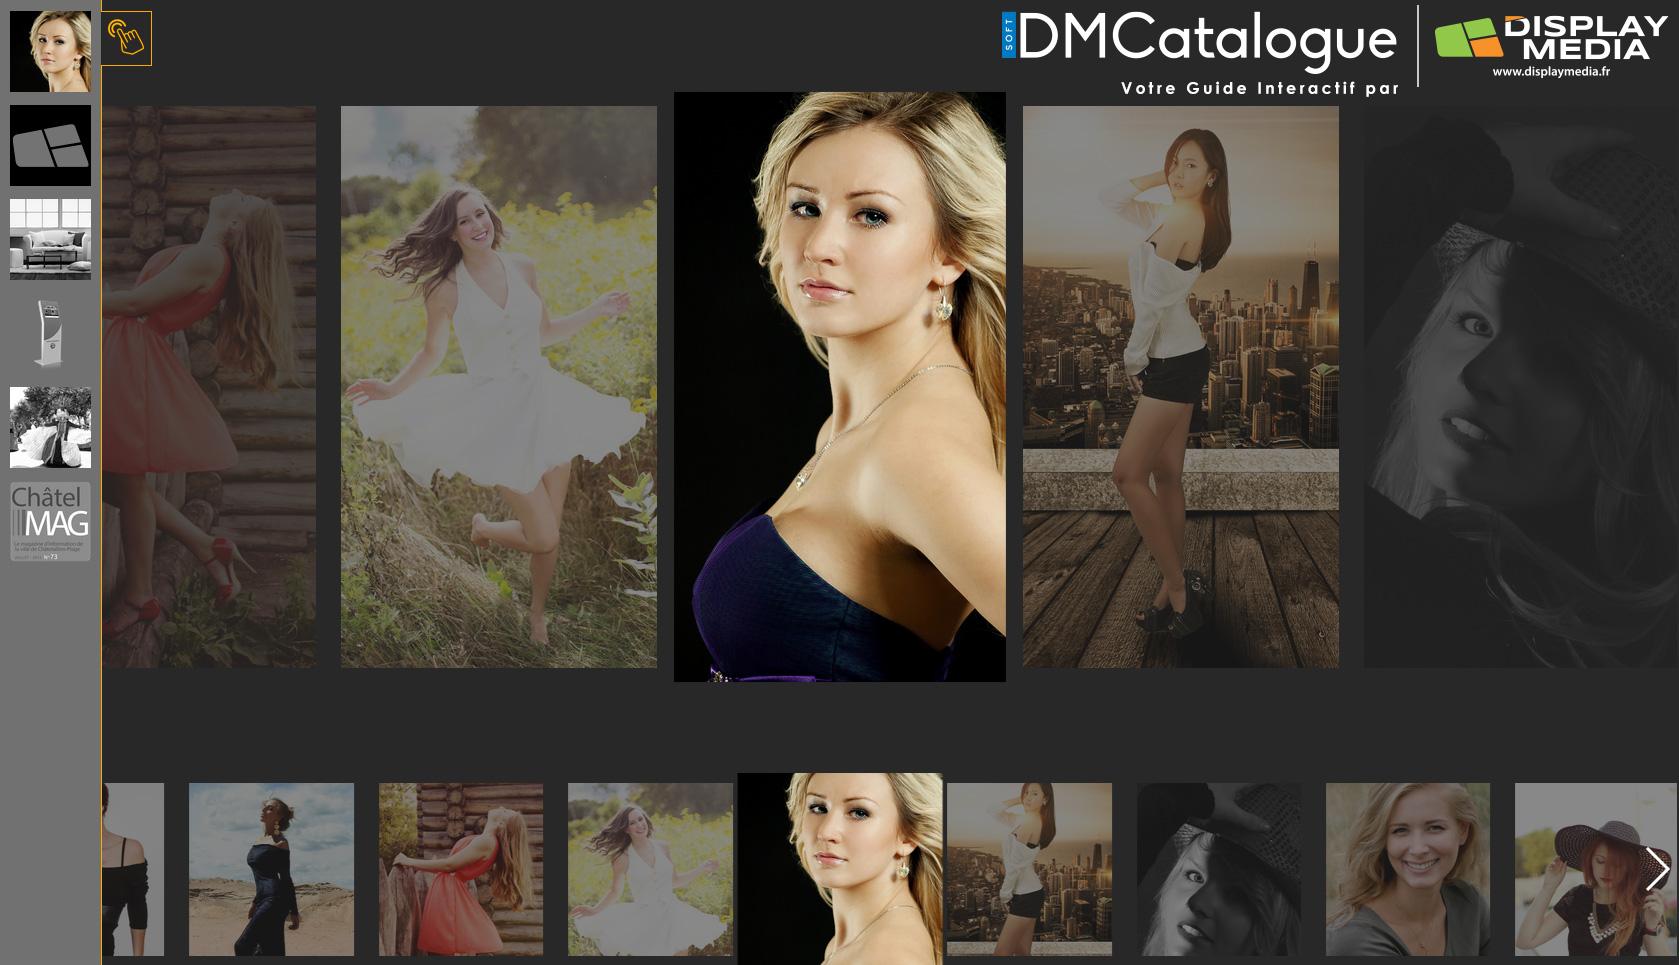 Logiciel Création Catalogue Interactif